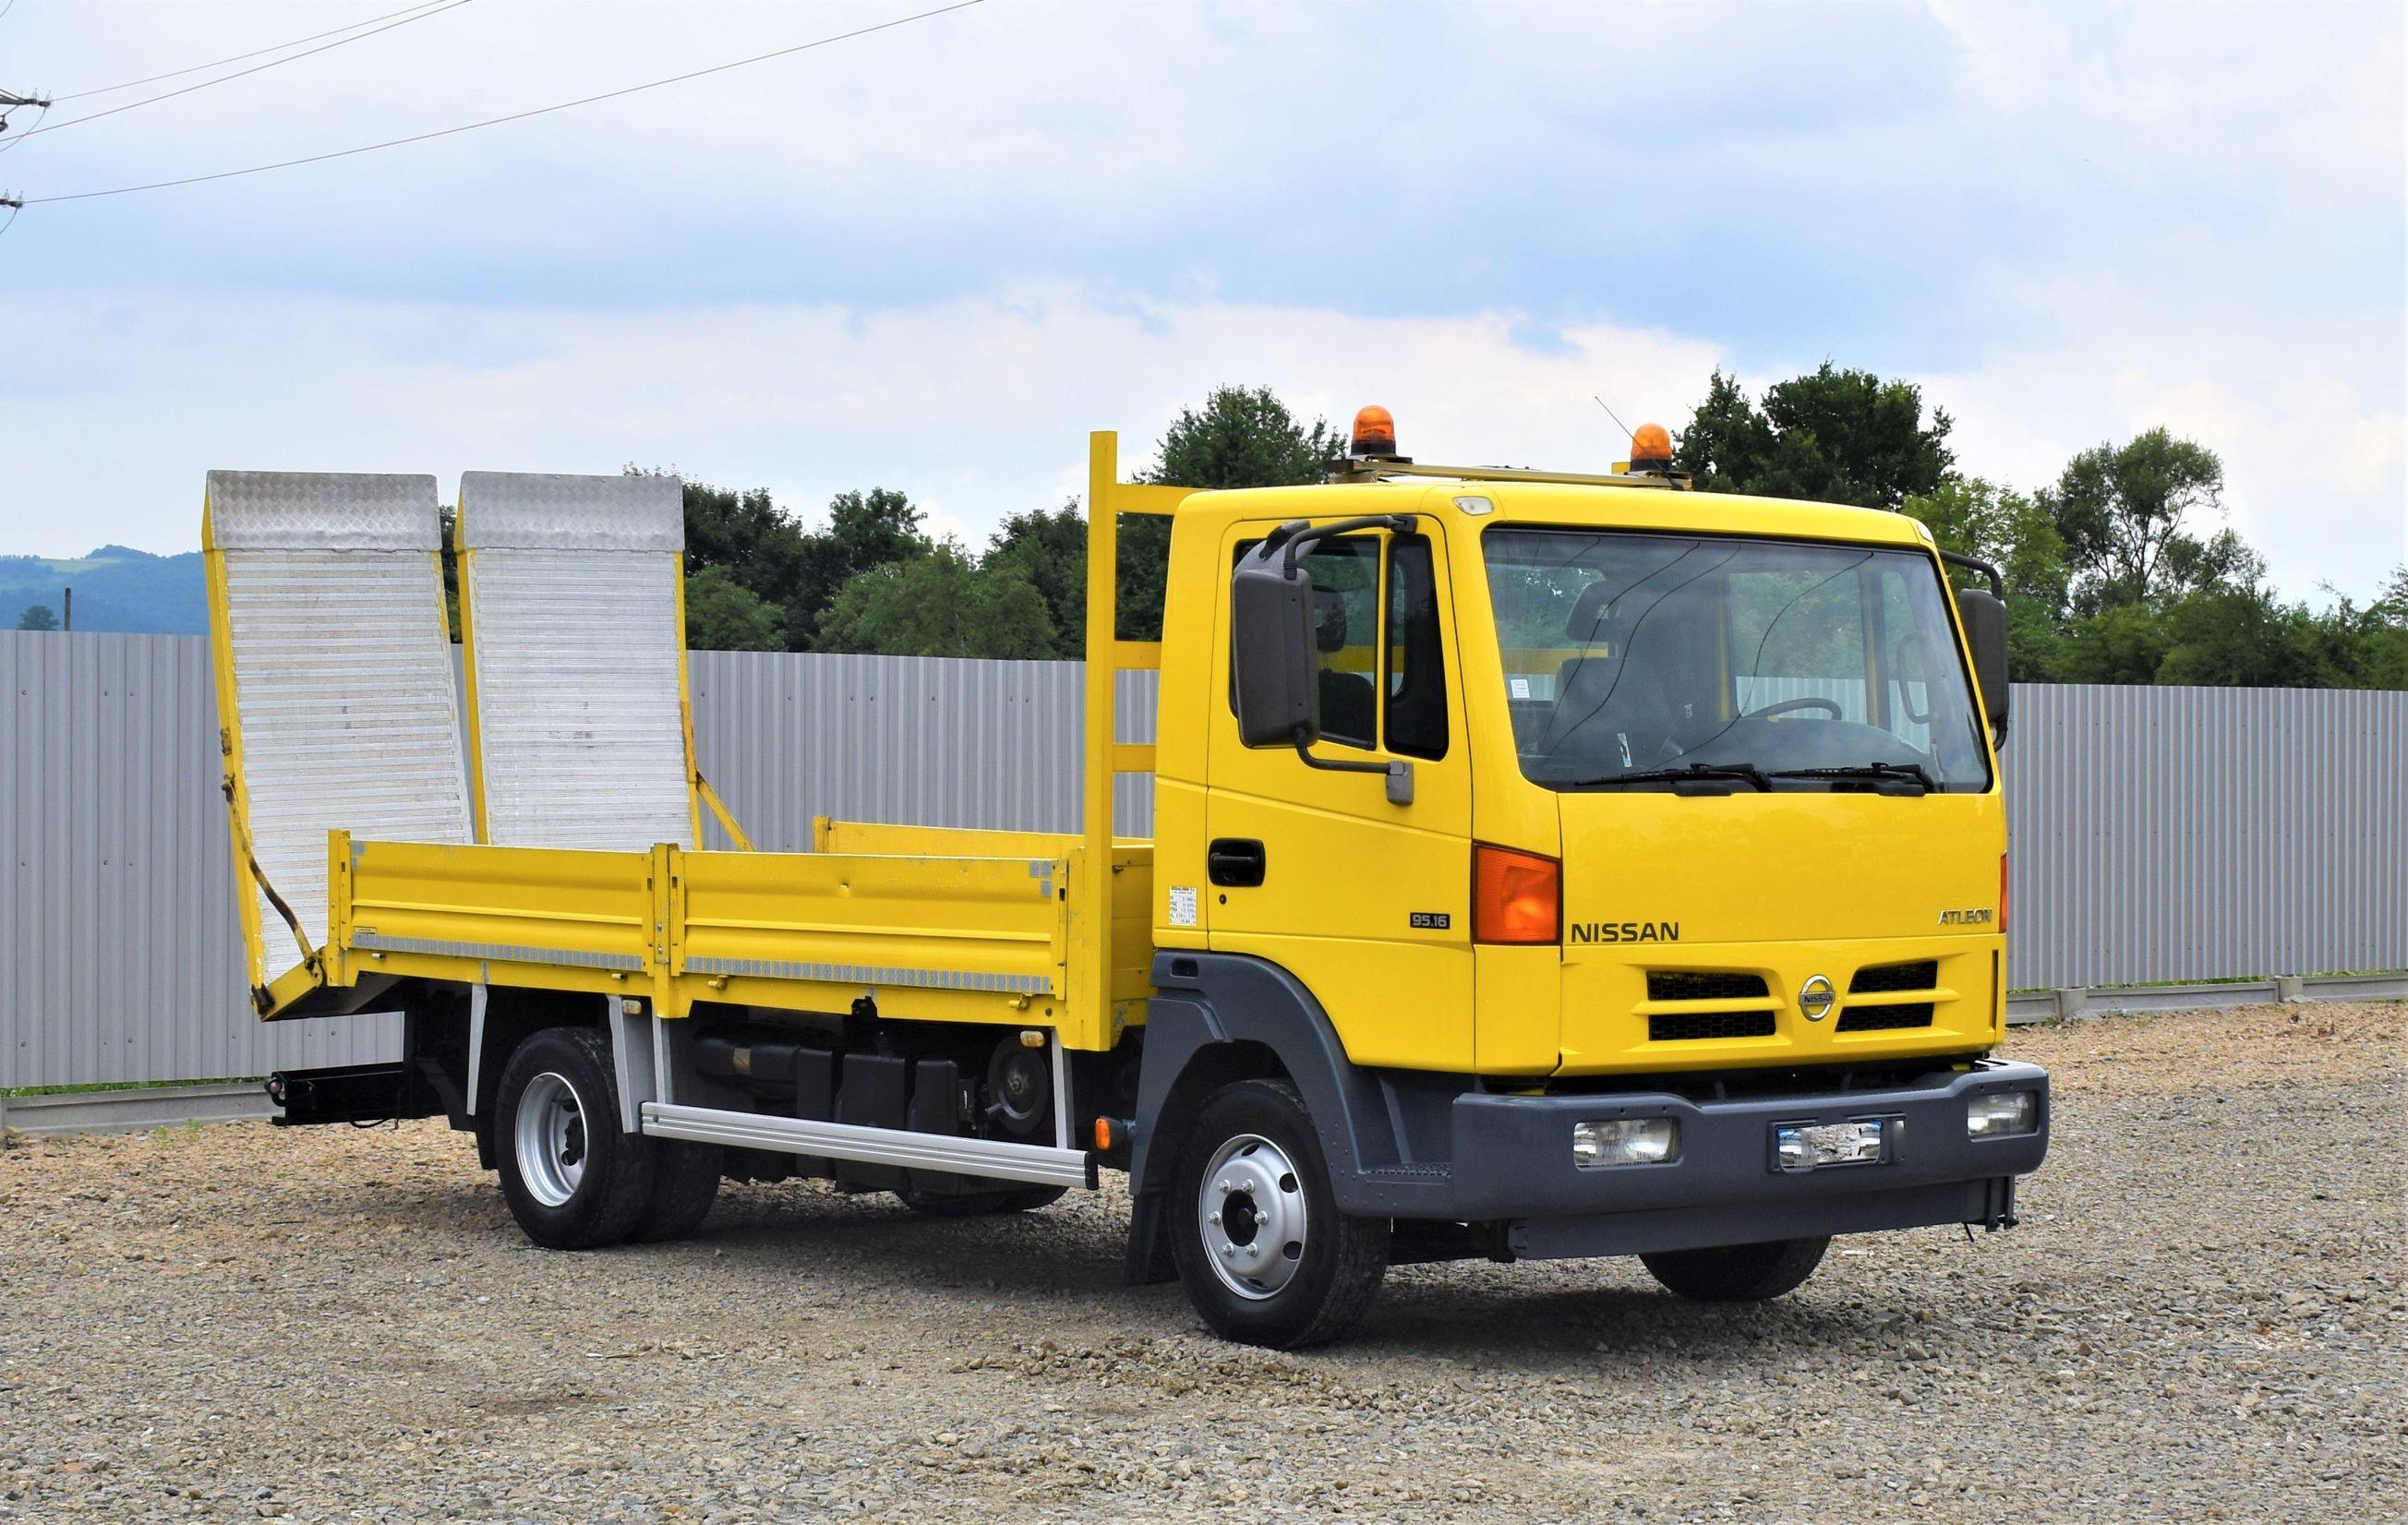 2007-nissan-atleon-95-16-equipment-cover-image